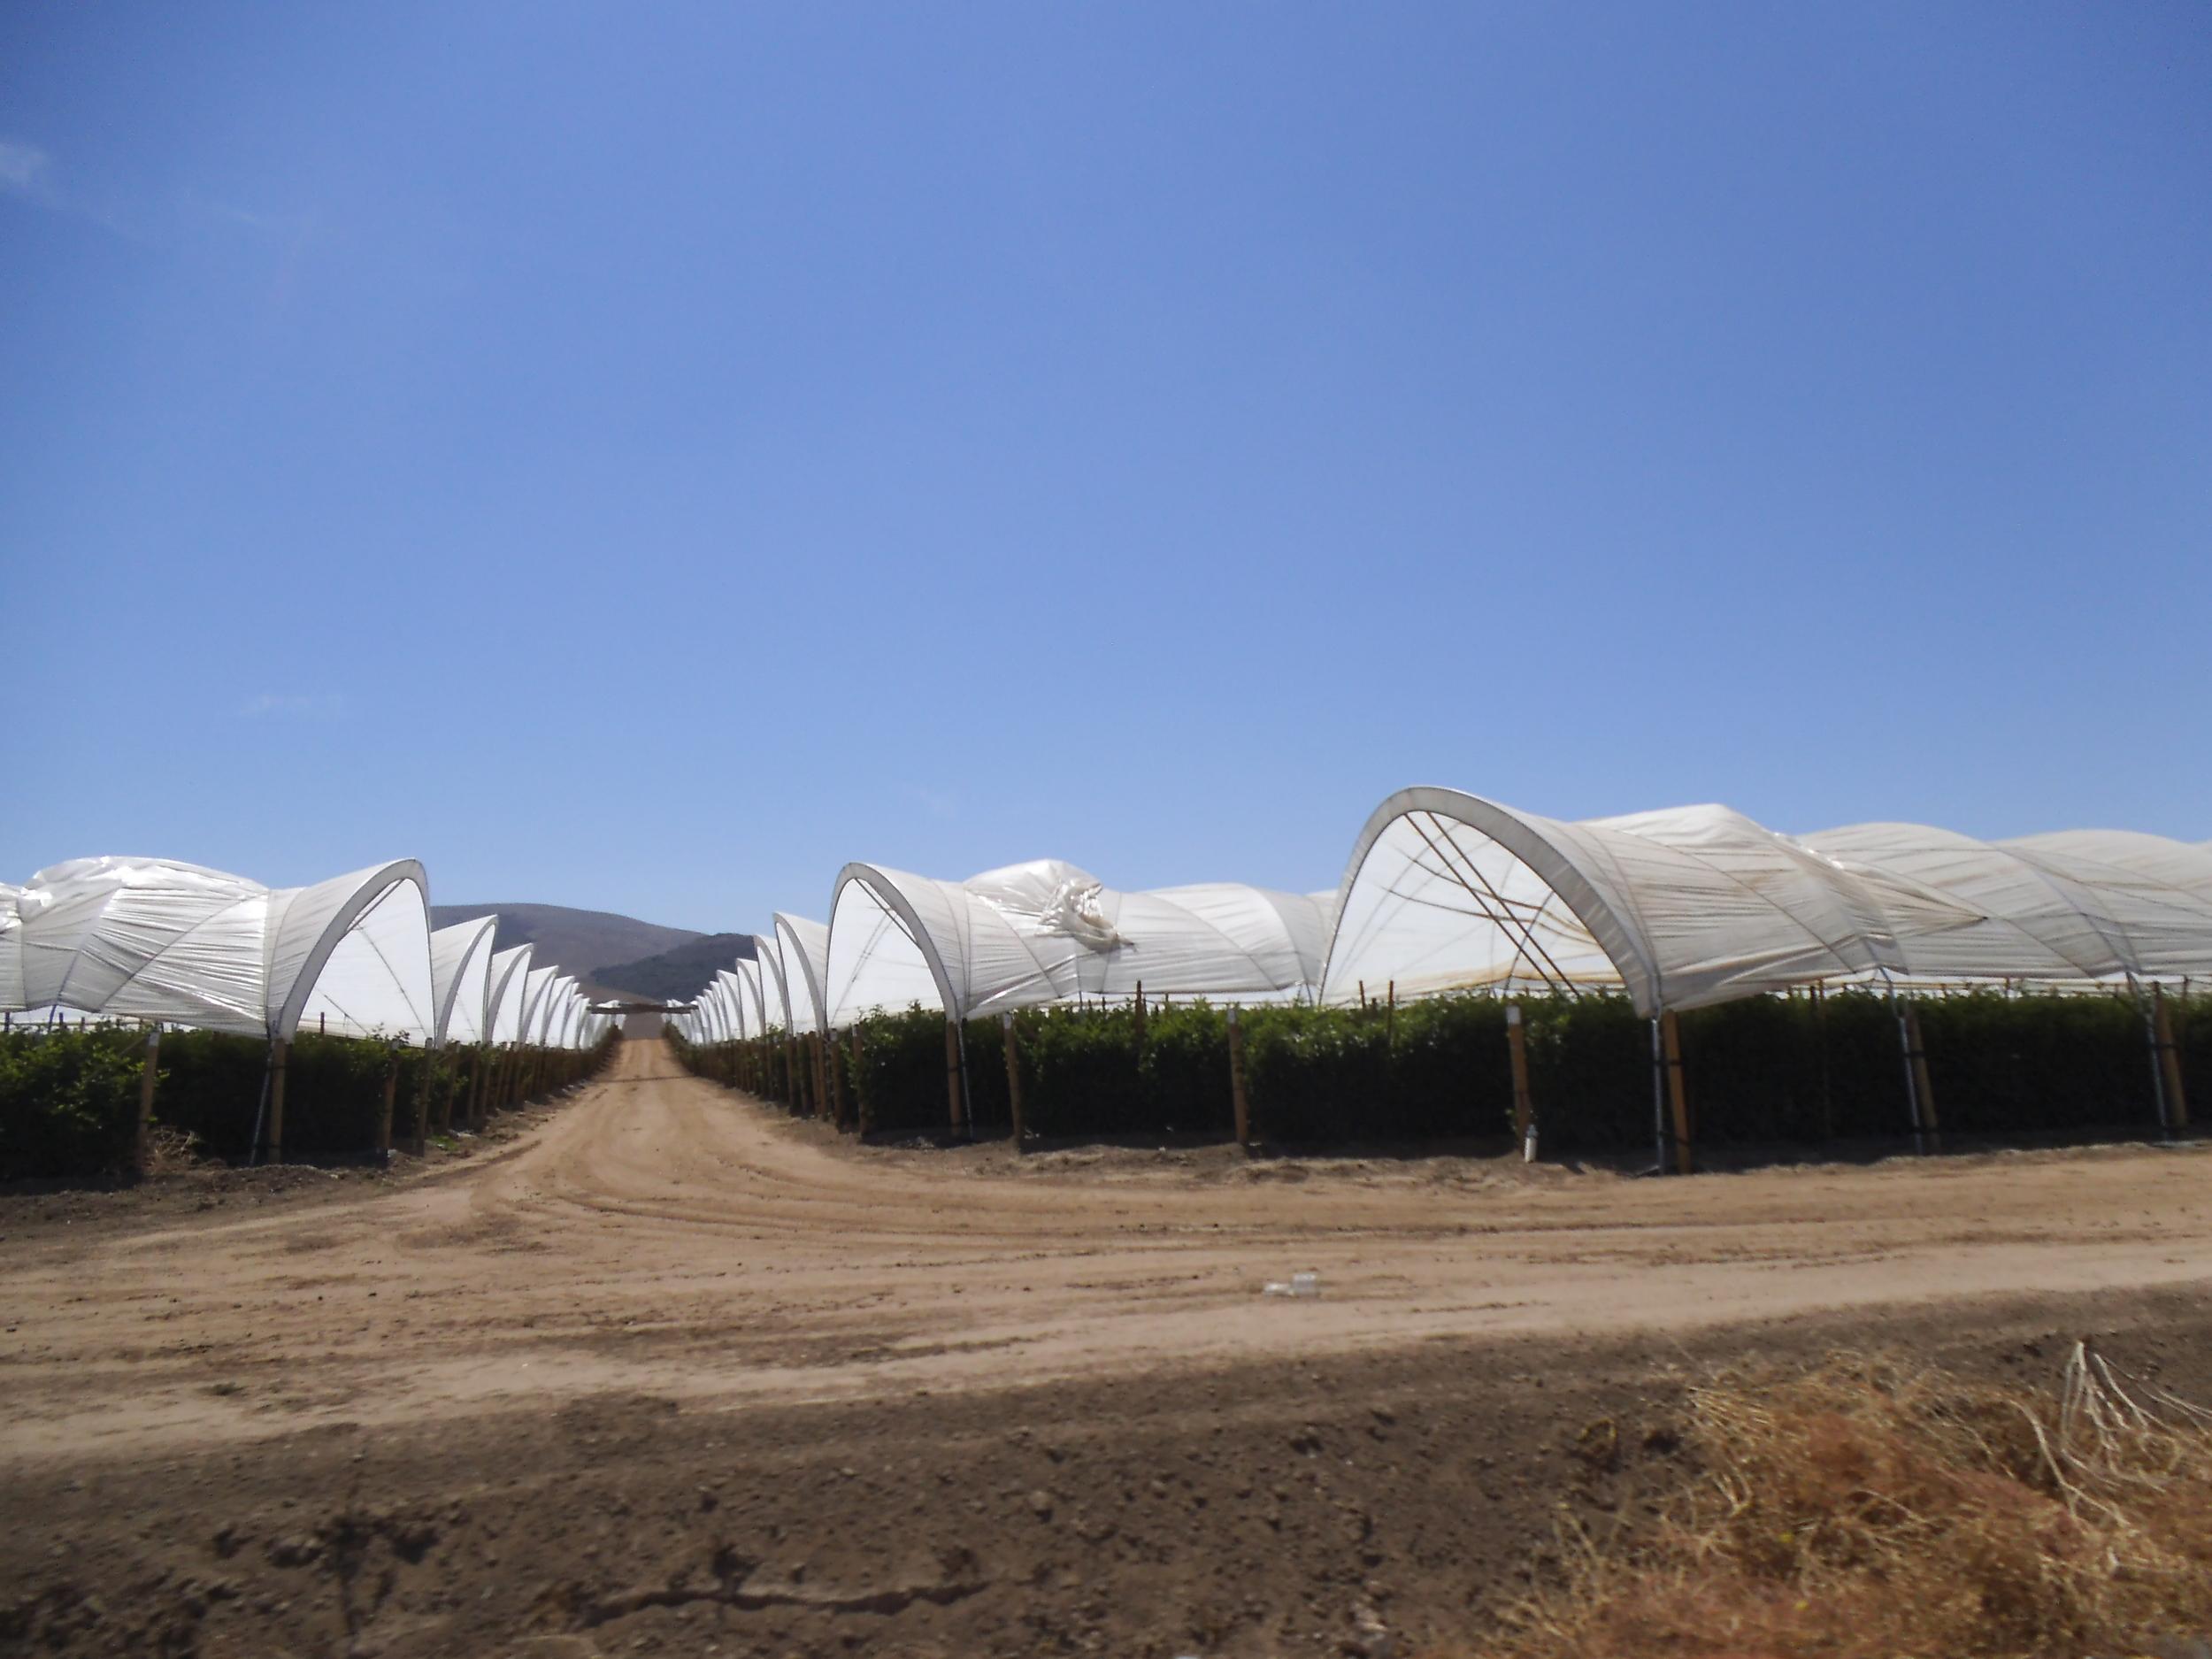 Polytunnels , California, USA, 2014